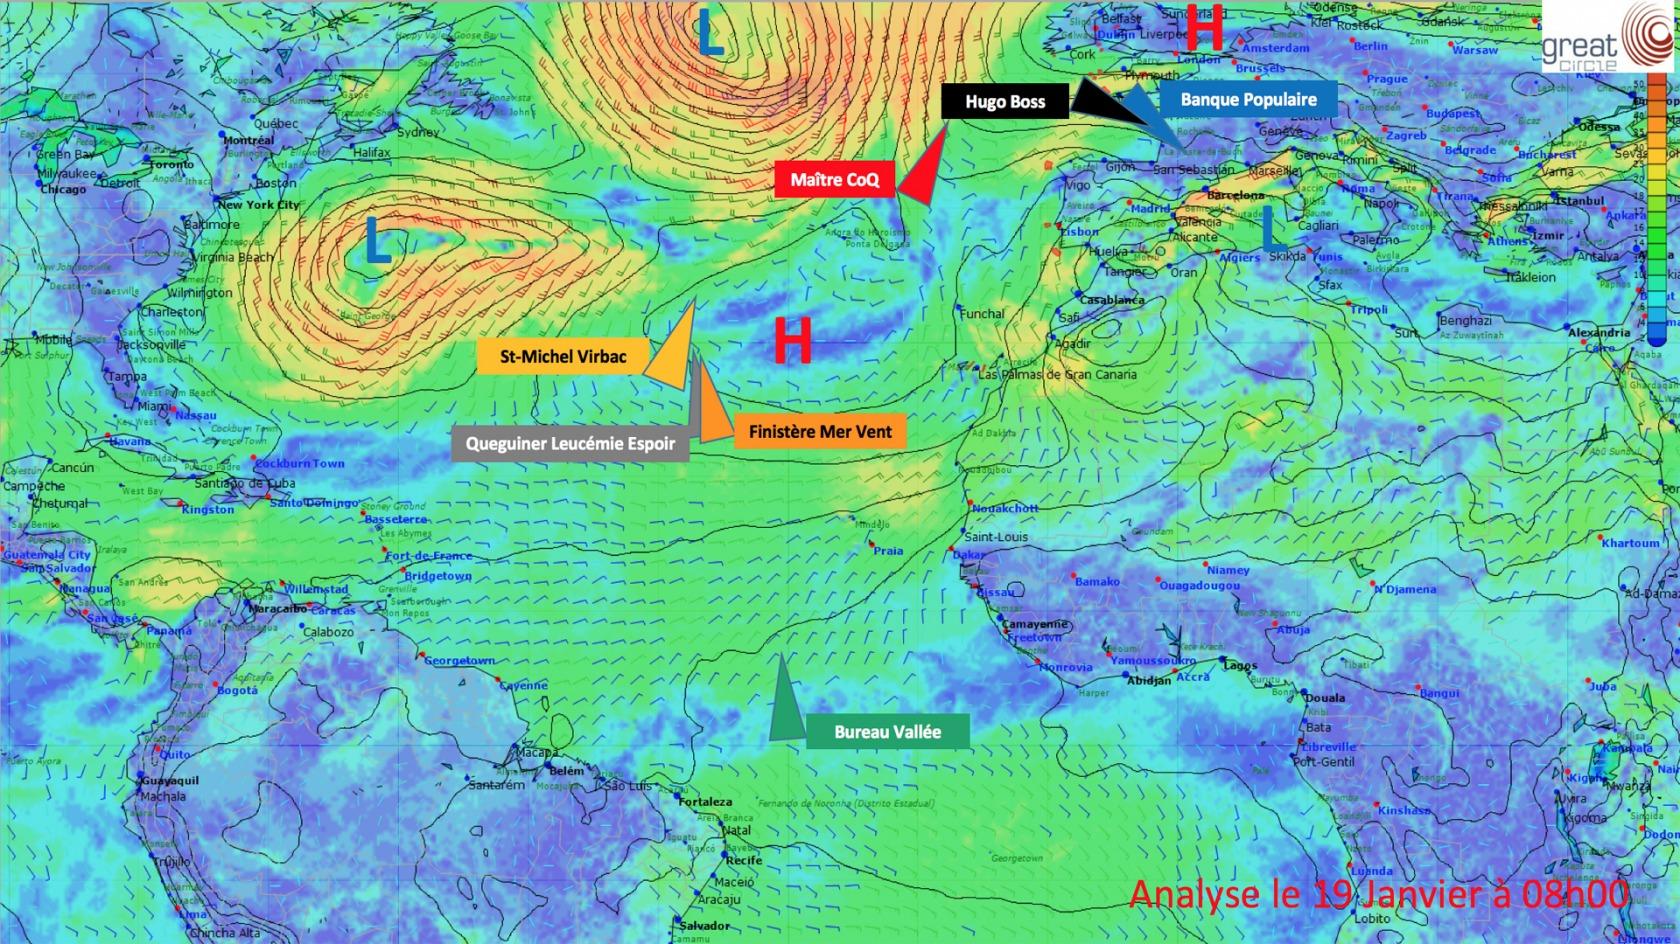 News The North Atlantic Headache Vendée Globe